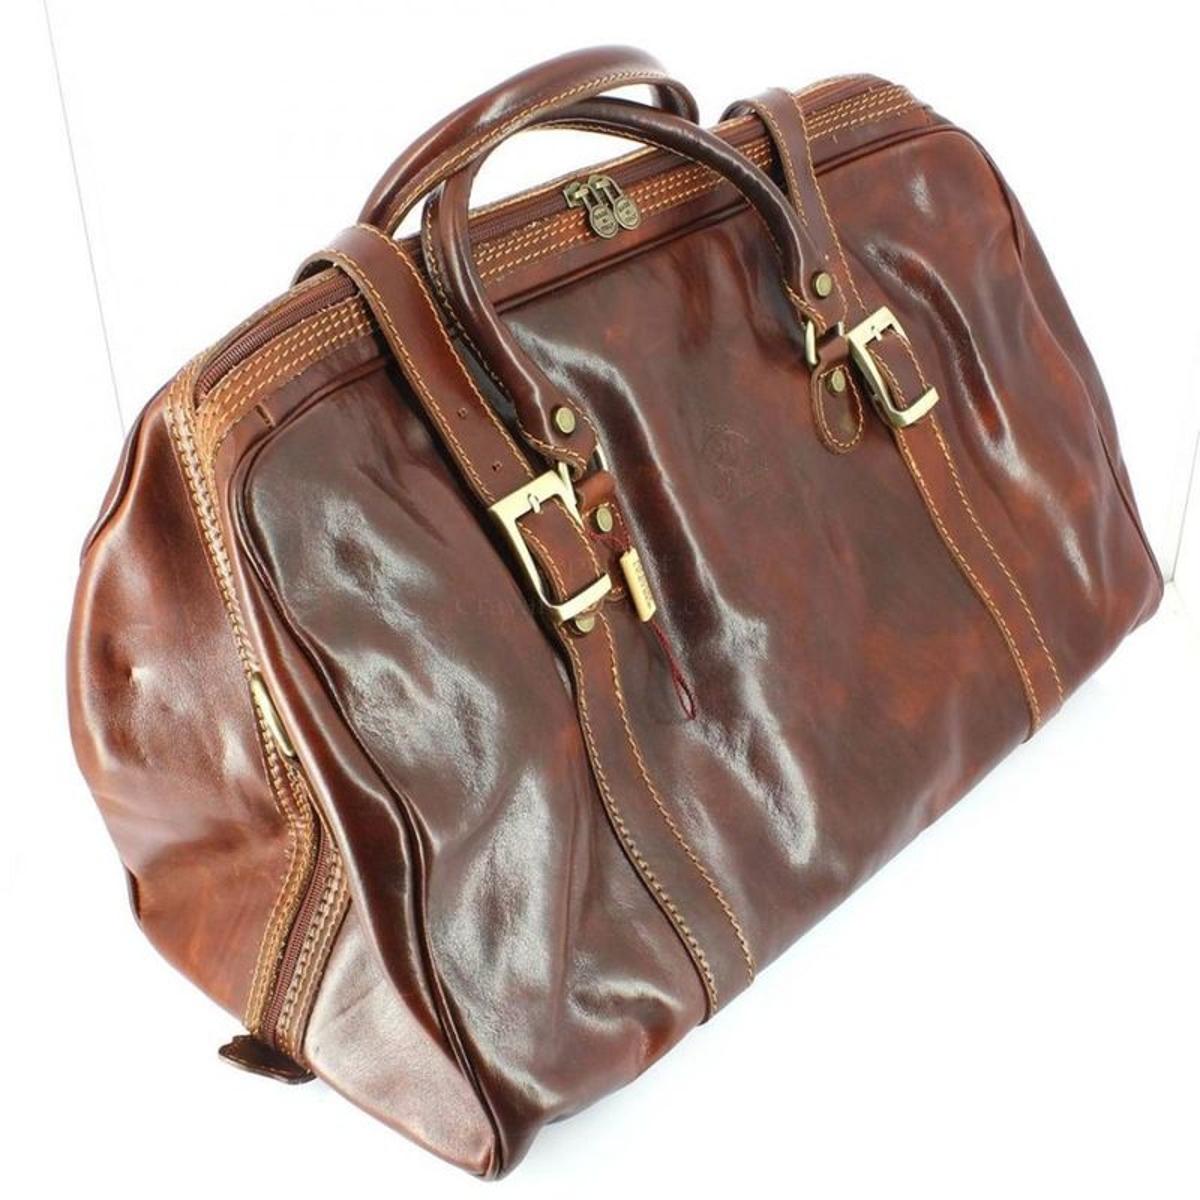 Caracalla, sac week end marron clair, chestnut